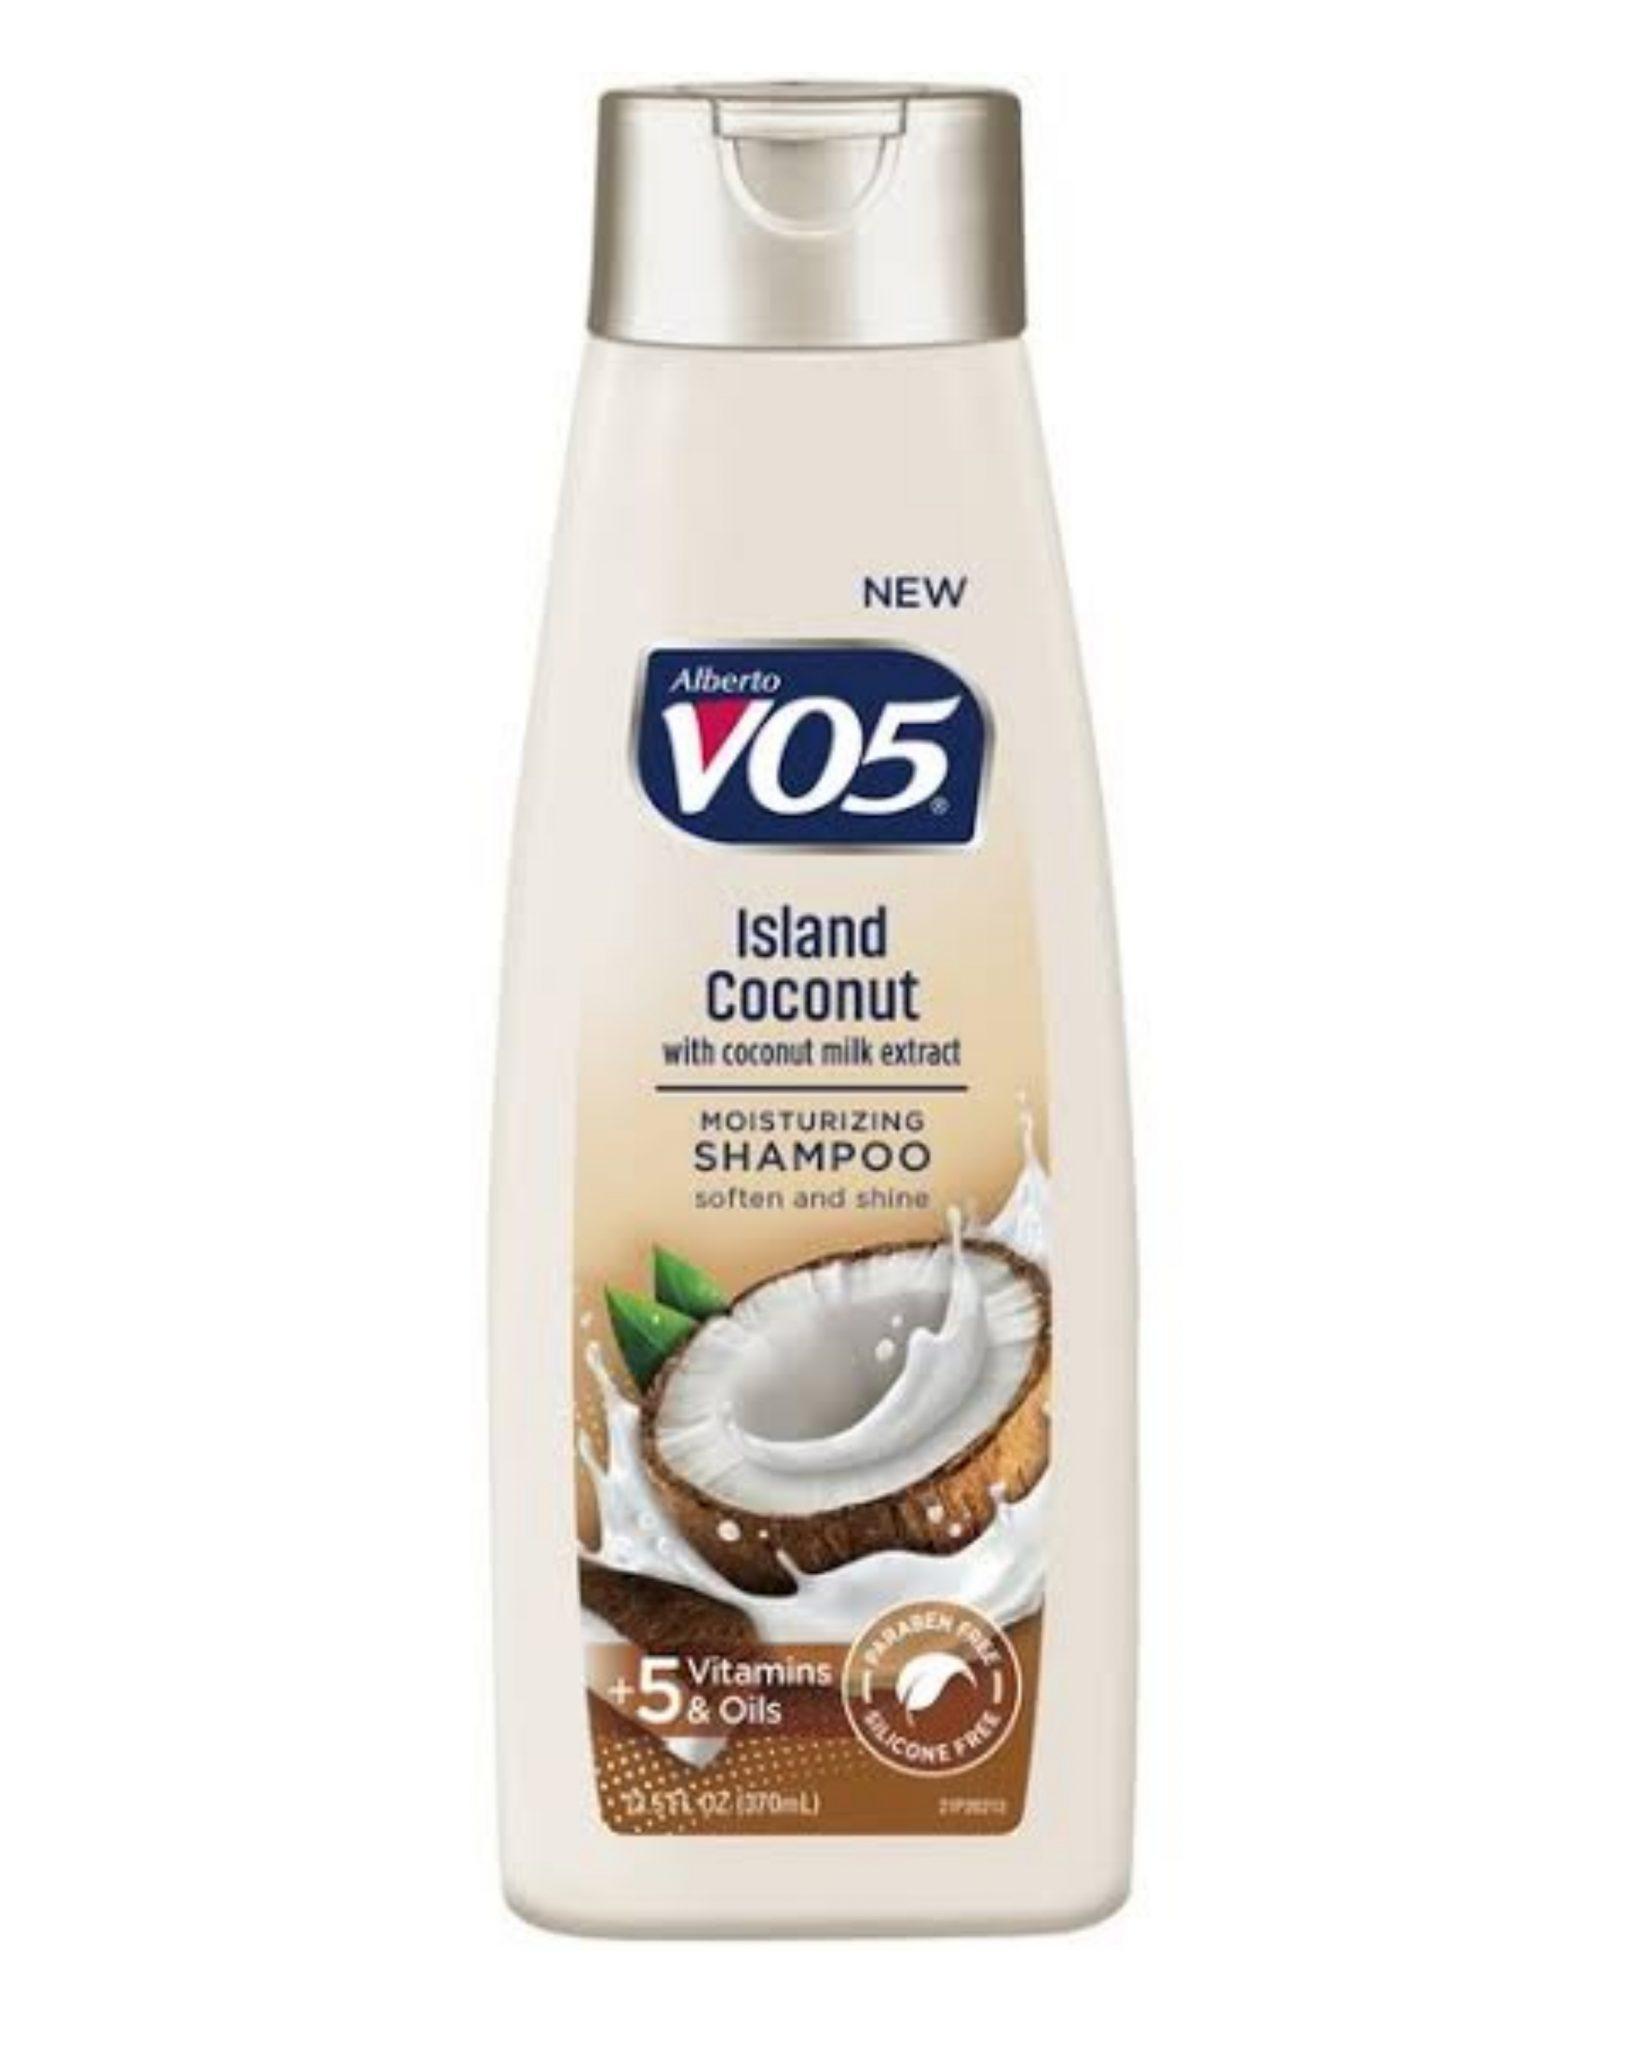 Alberto VO5 Island Coconut Moisturizing Shampoo 12.5Oz